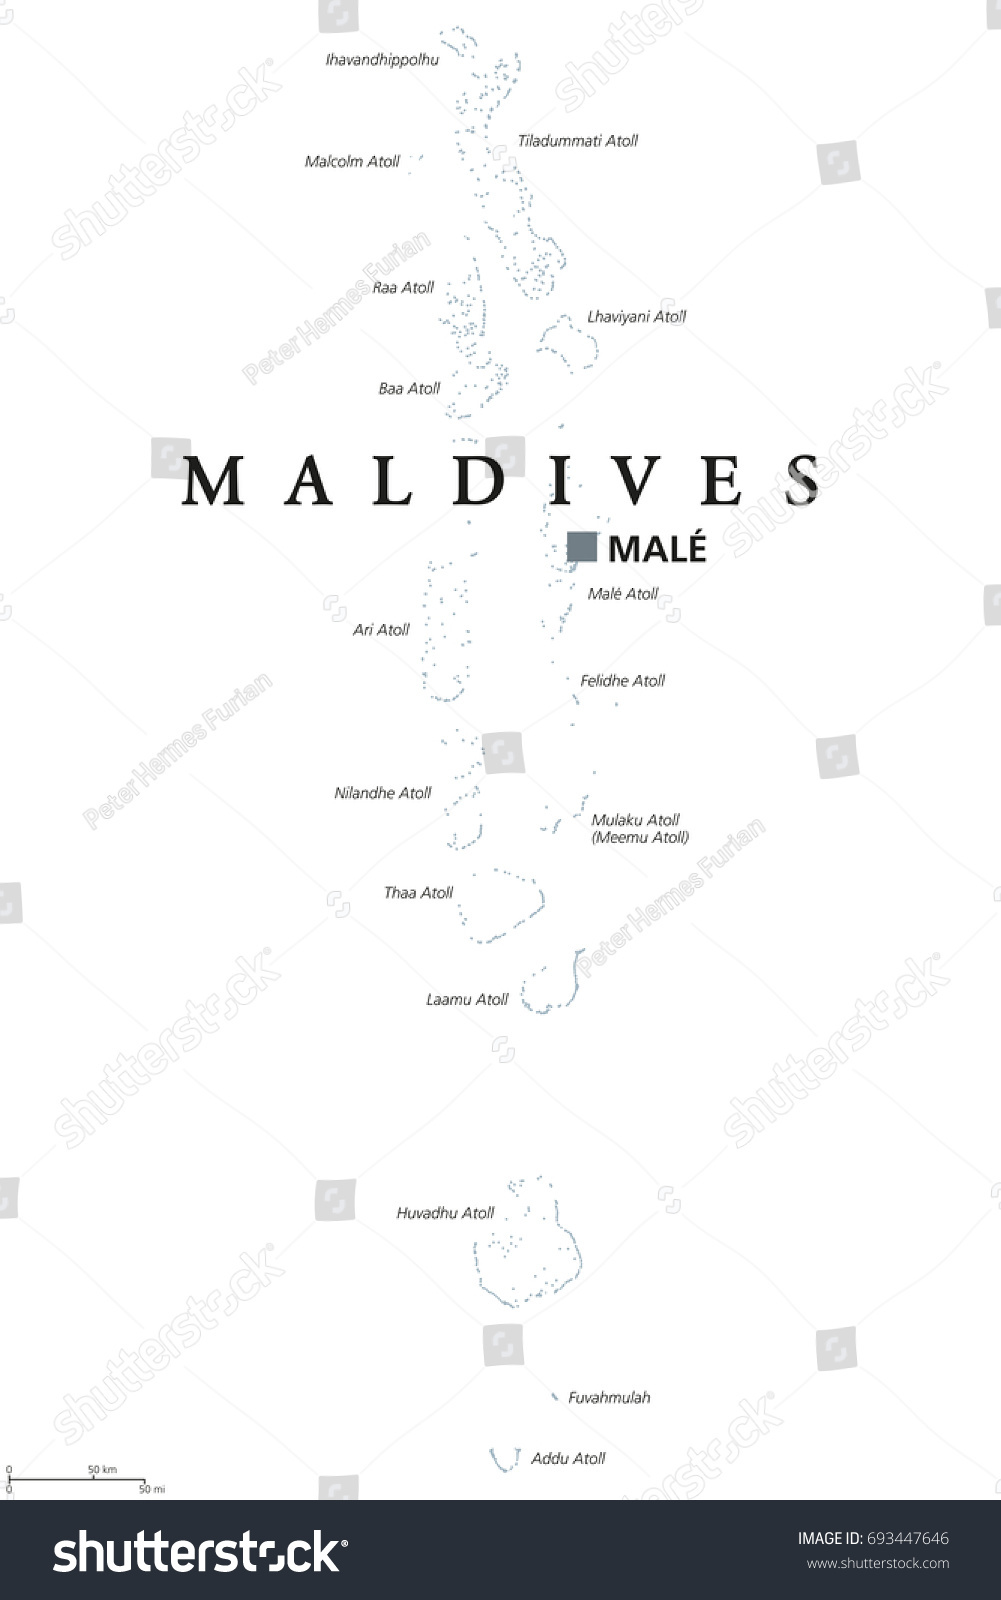 Maldives Political Map Capital Male English Stock Vector - male map